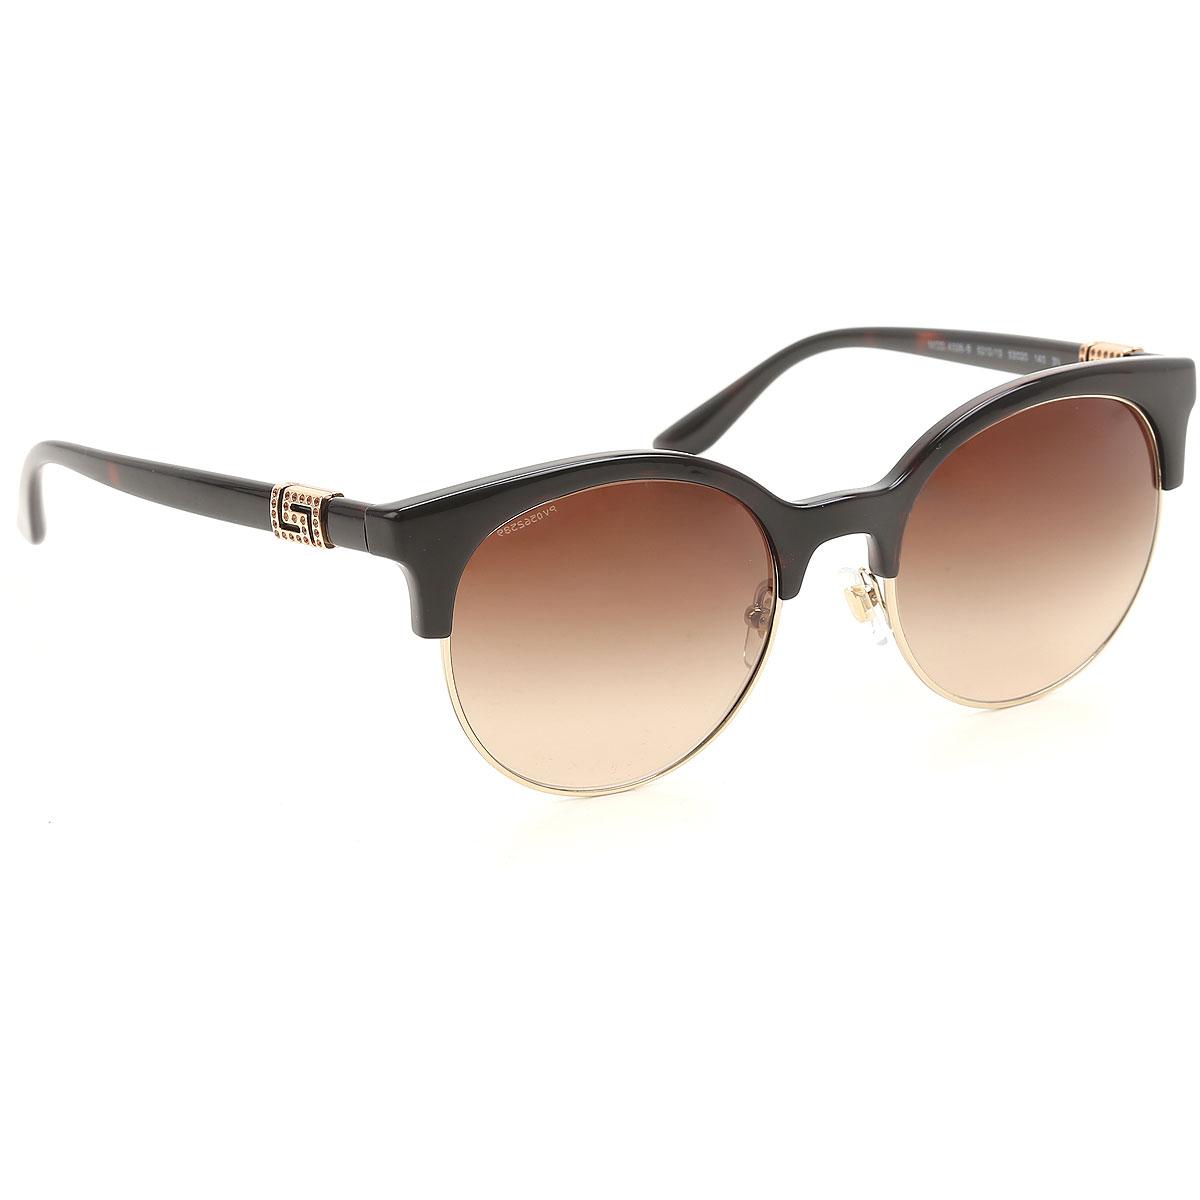 Gianni Versace Sunglasses On Sale, Brown, 2019